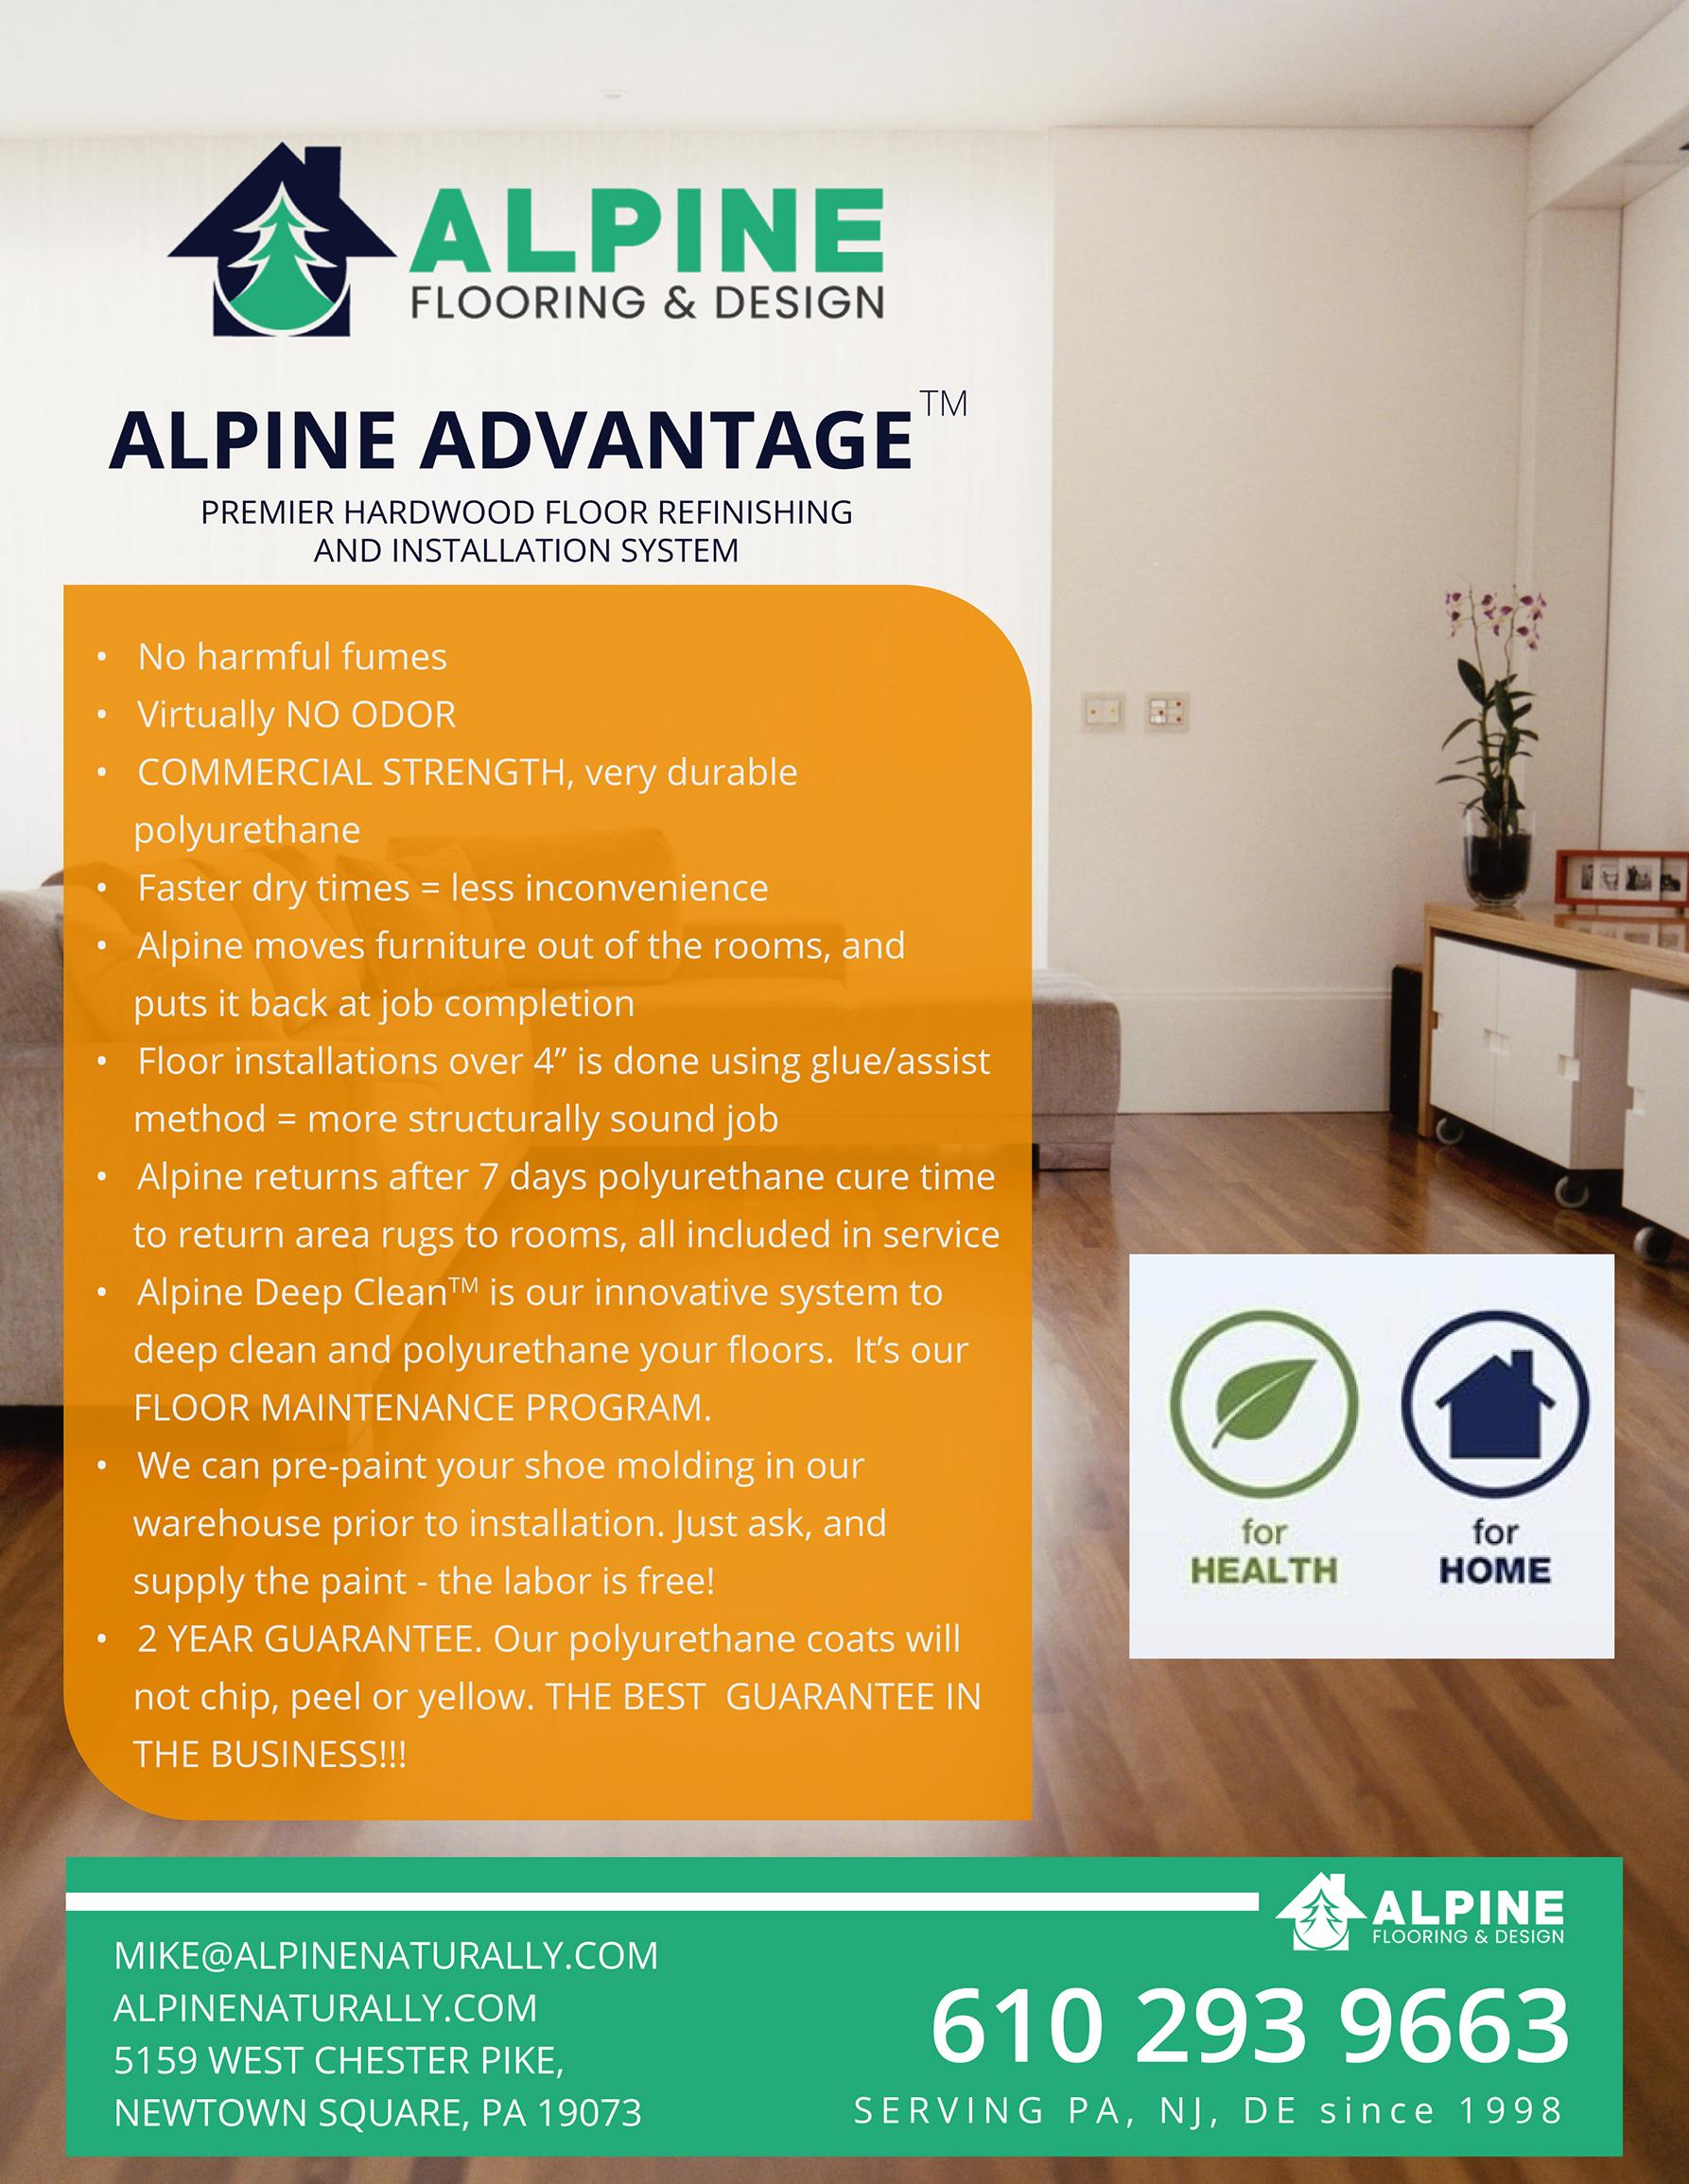 Alpine Advantage 1